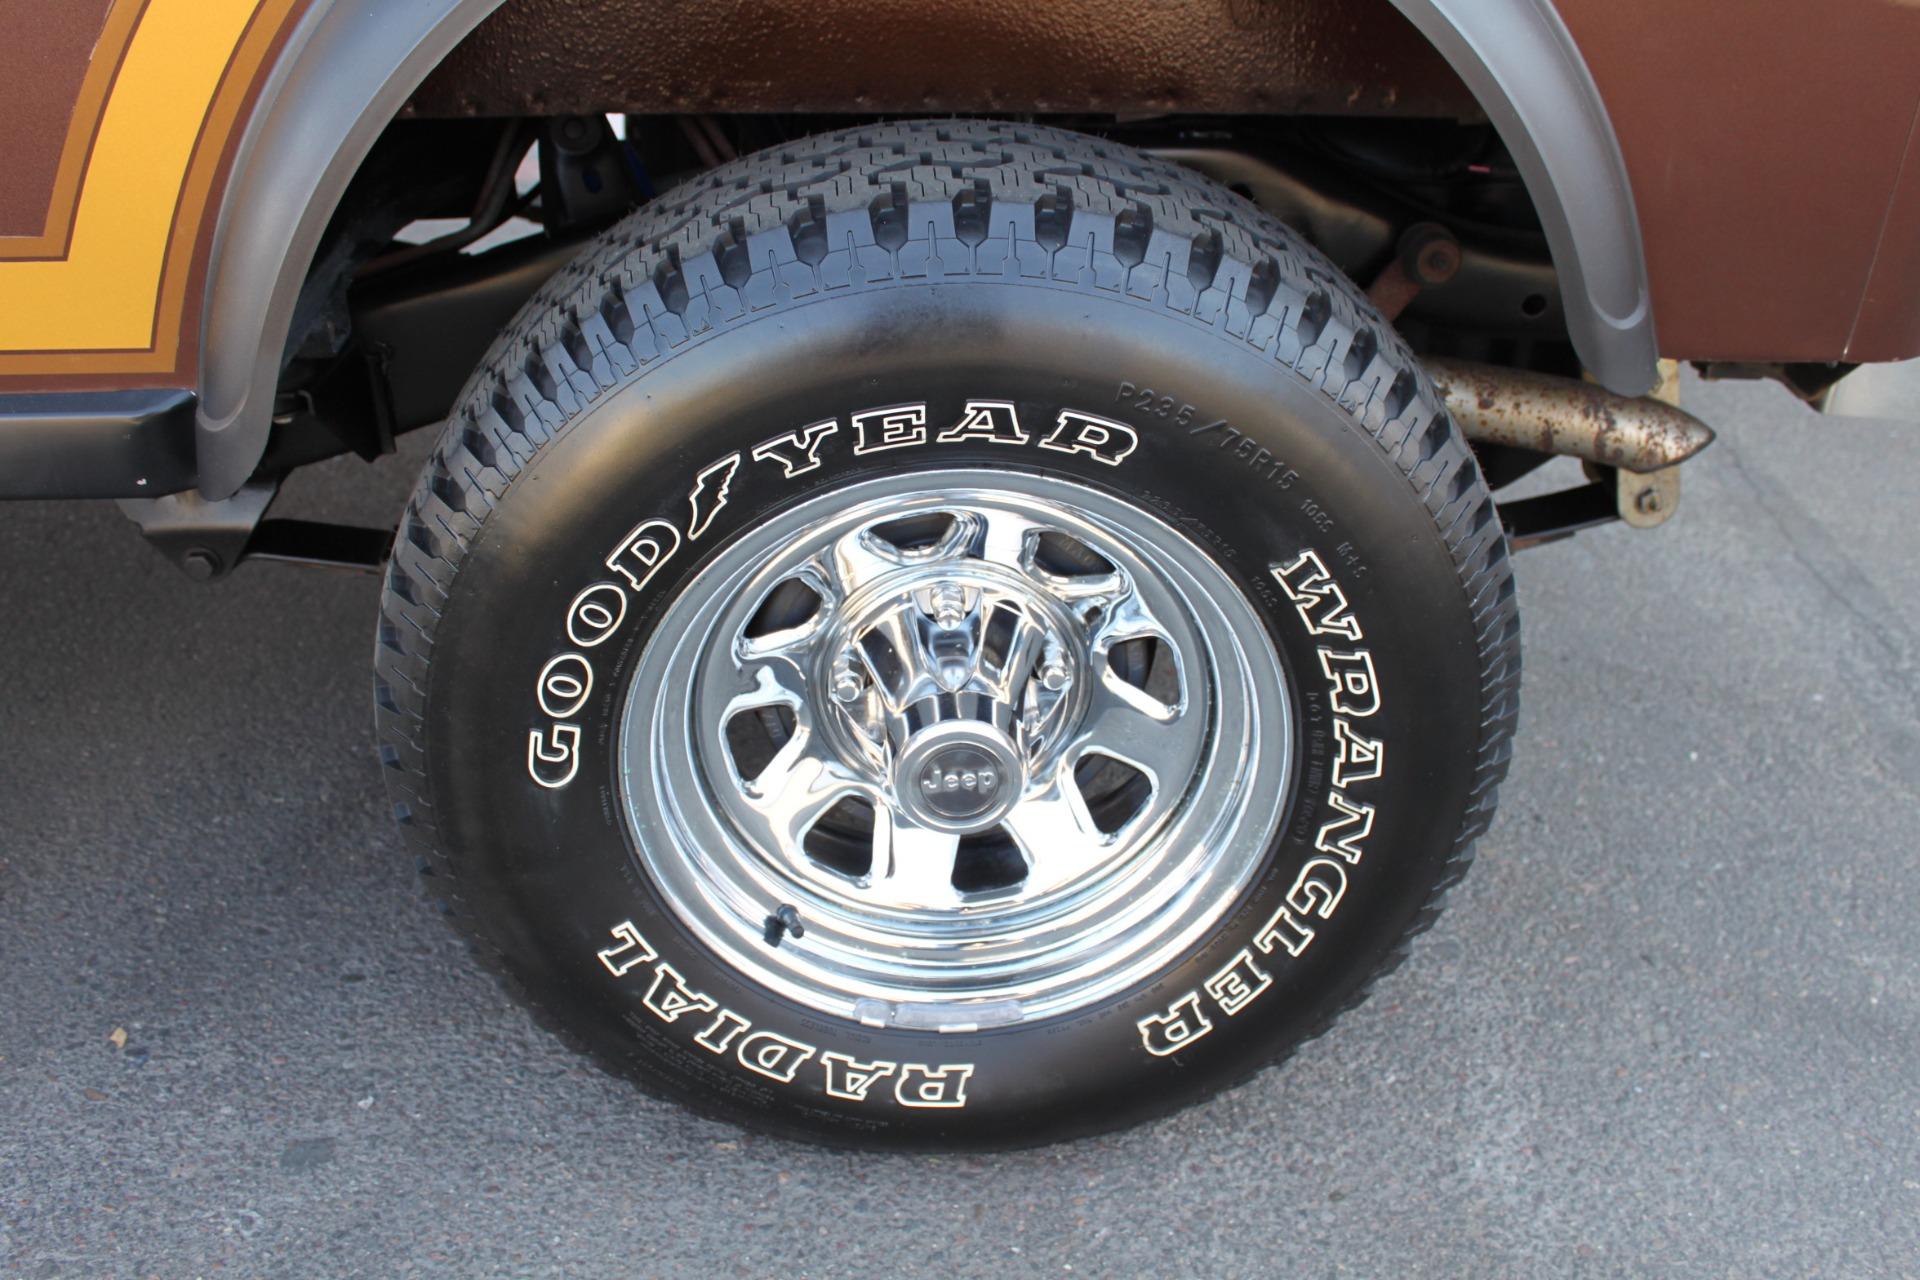 Used-1985-Jeep-CJ-7-Laredo-4WD-Land-Rover